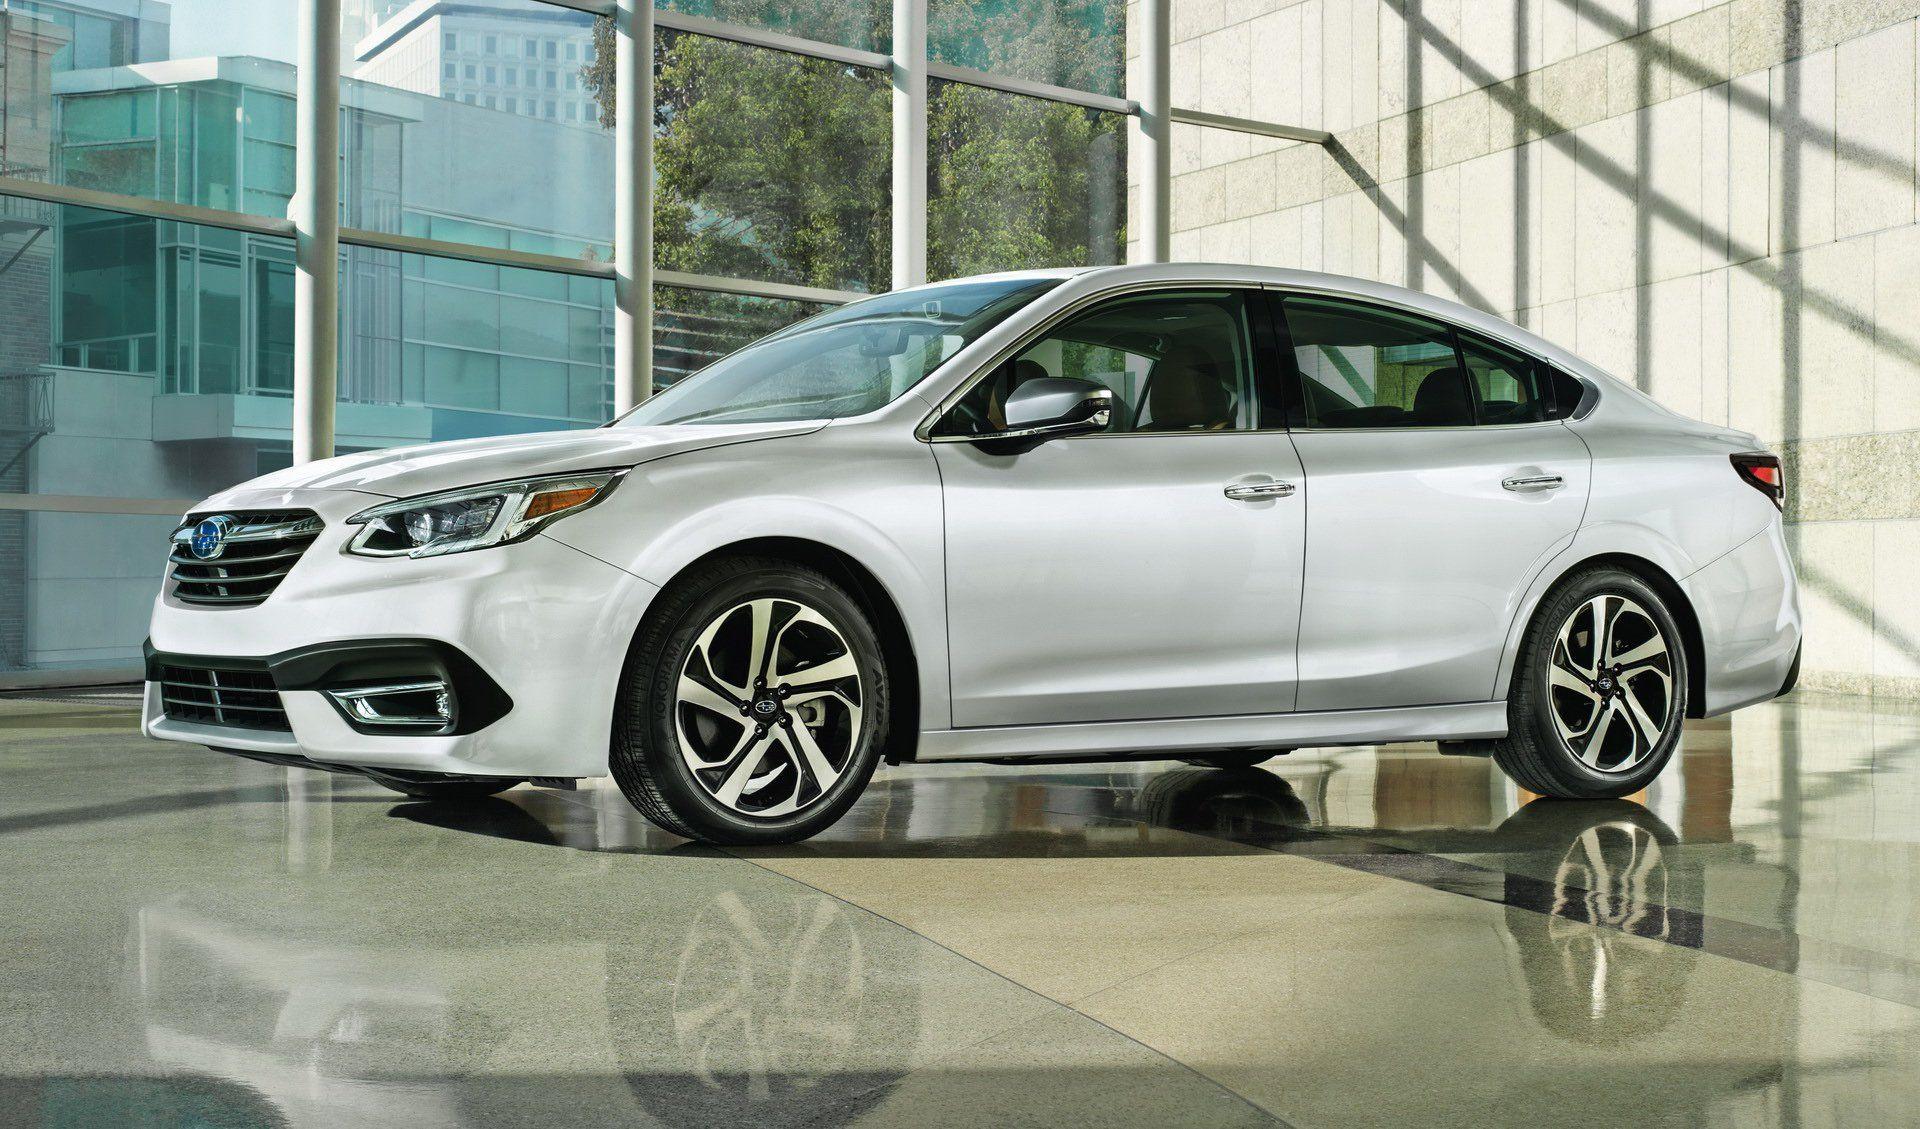 2020 Subaru Legacy Plays It Safe With Styling Gains 260hp Turbo Boxer Subaru Legacy Subaru Outback Subaru